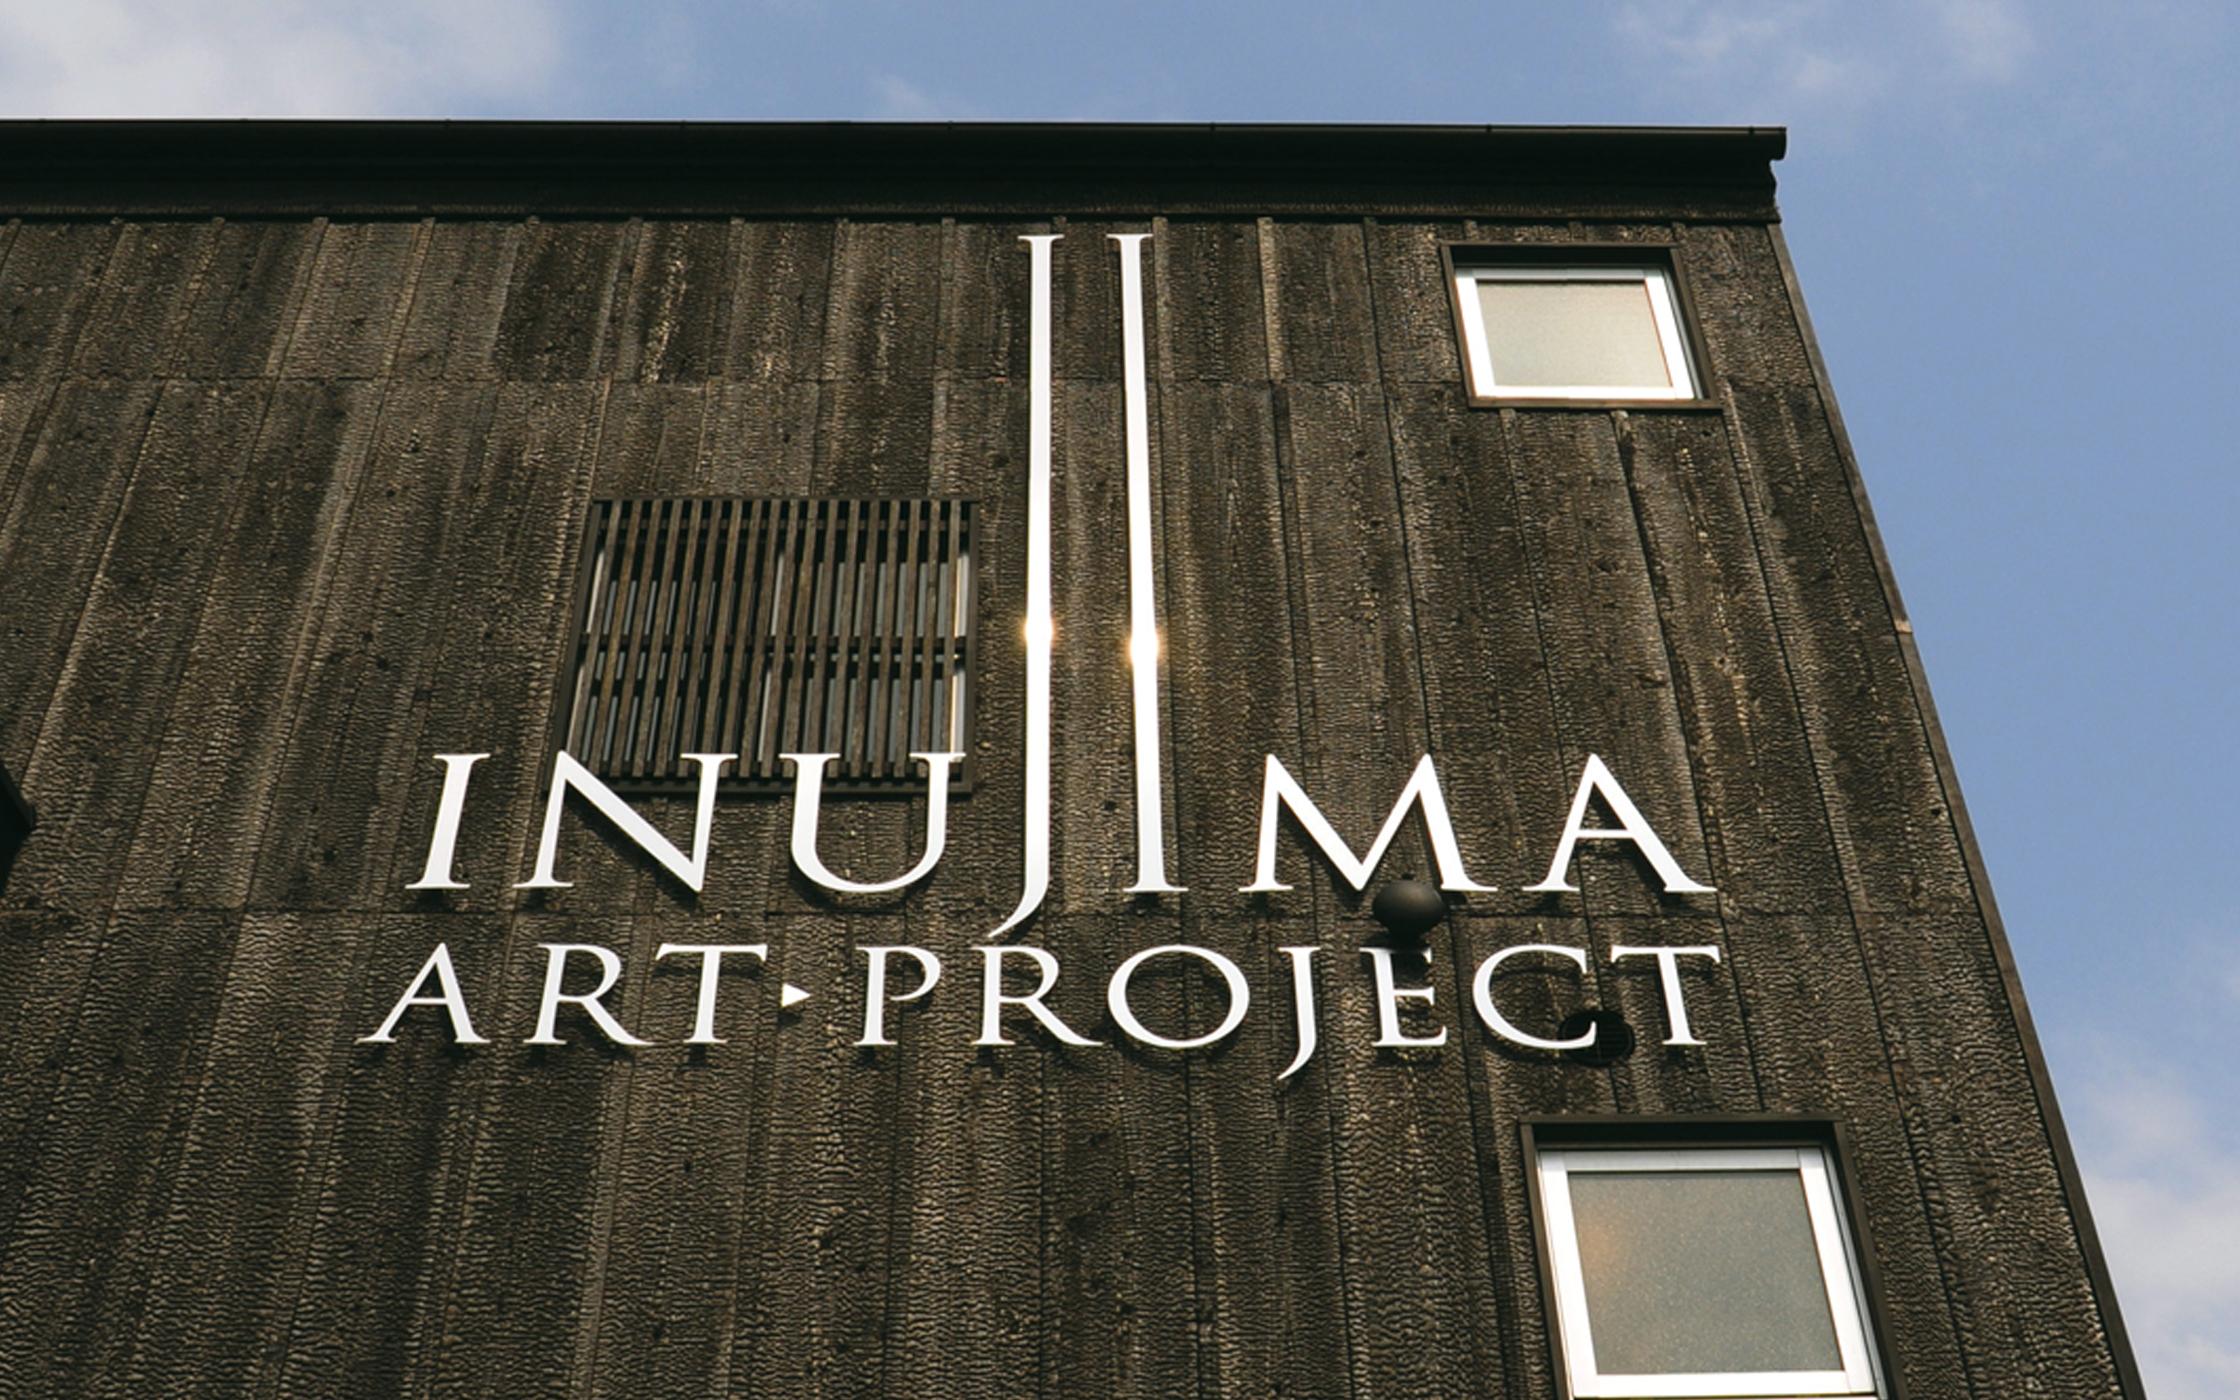 Inujima Art Project